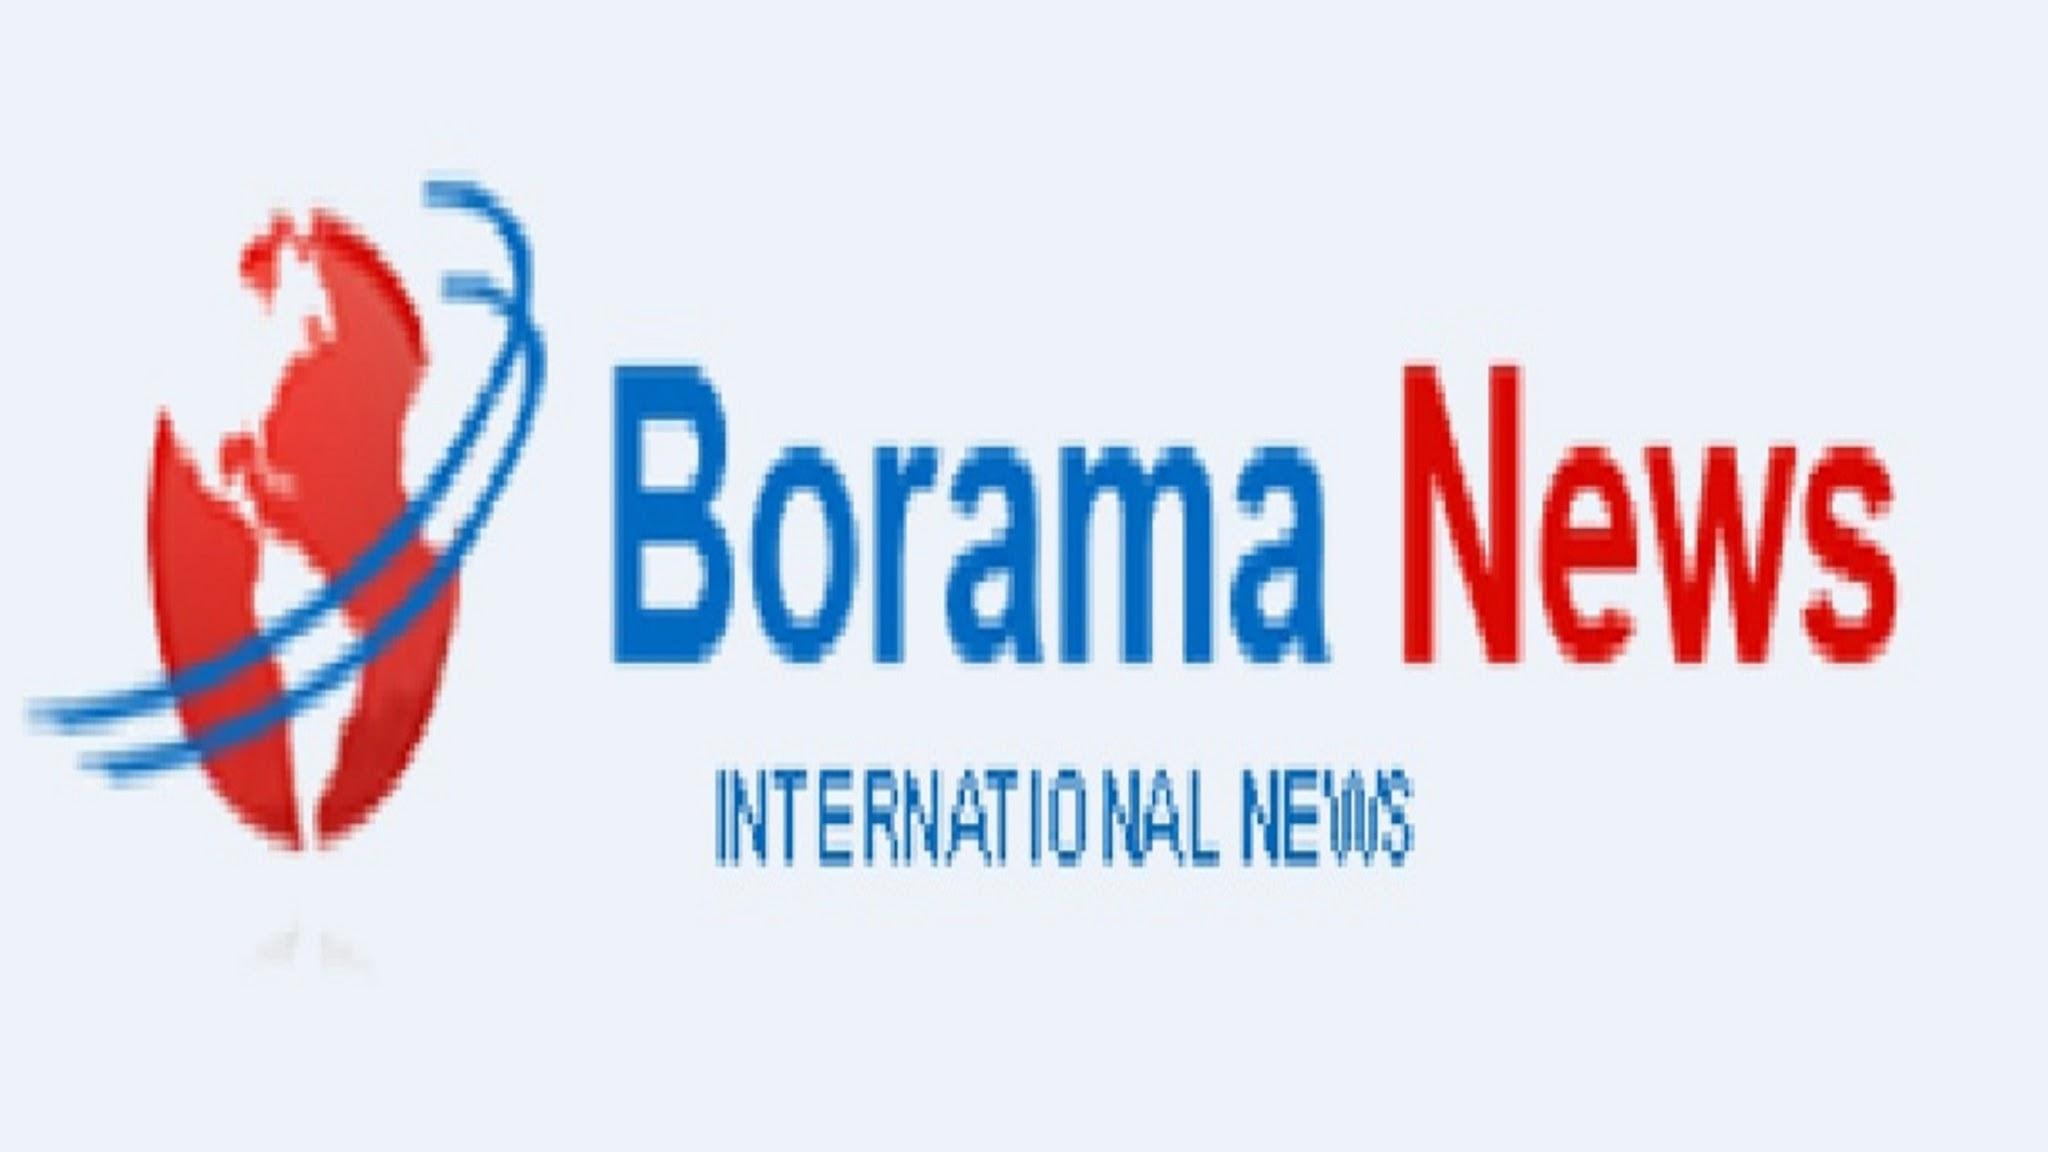 Boramanews